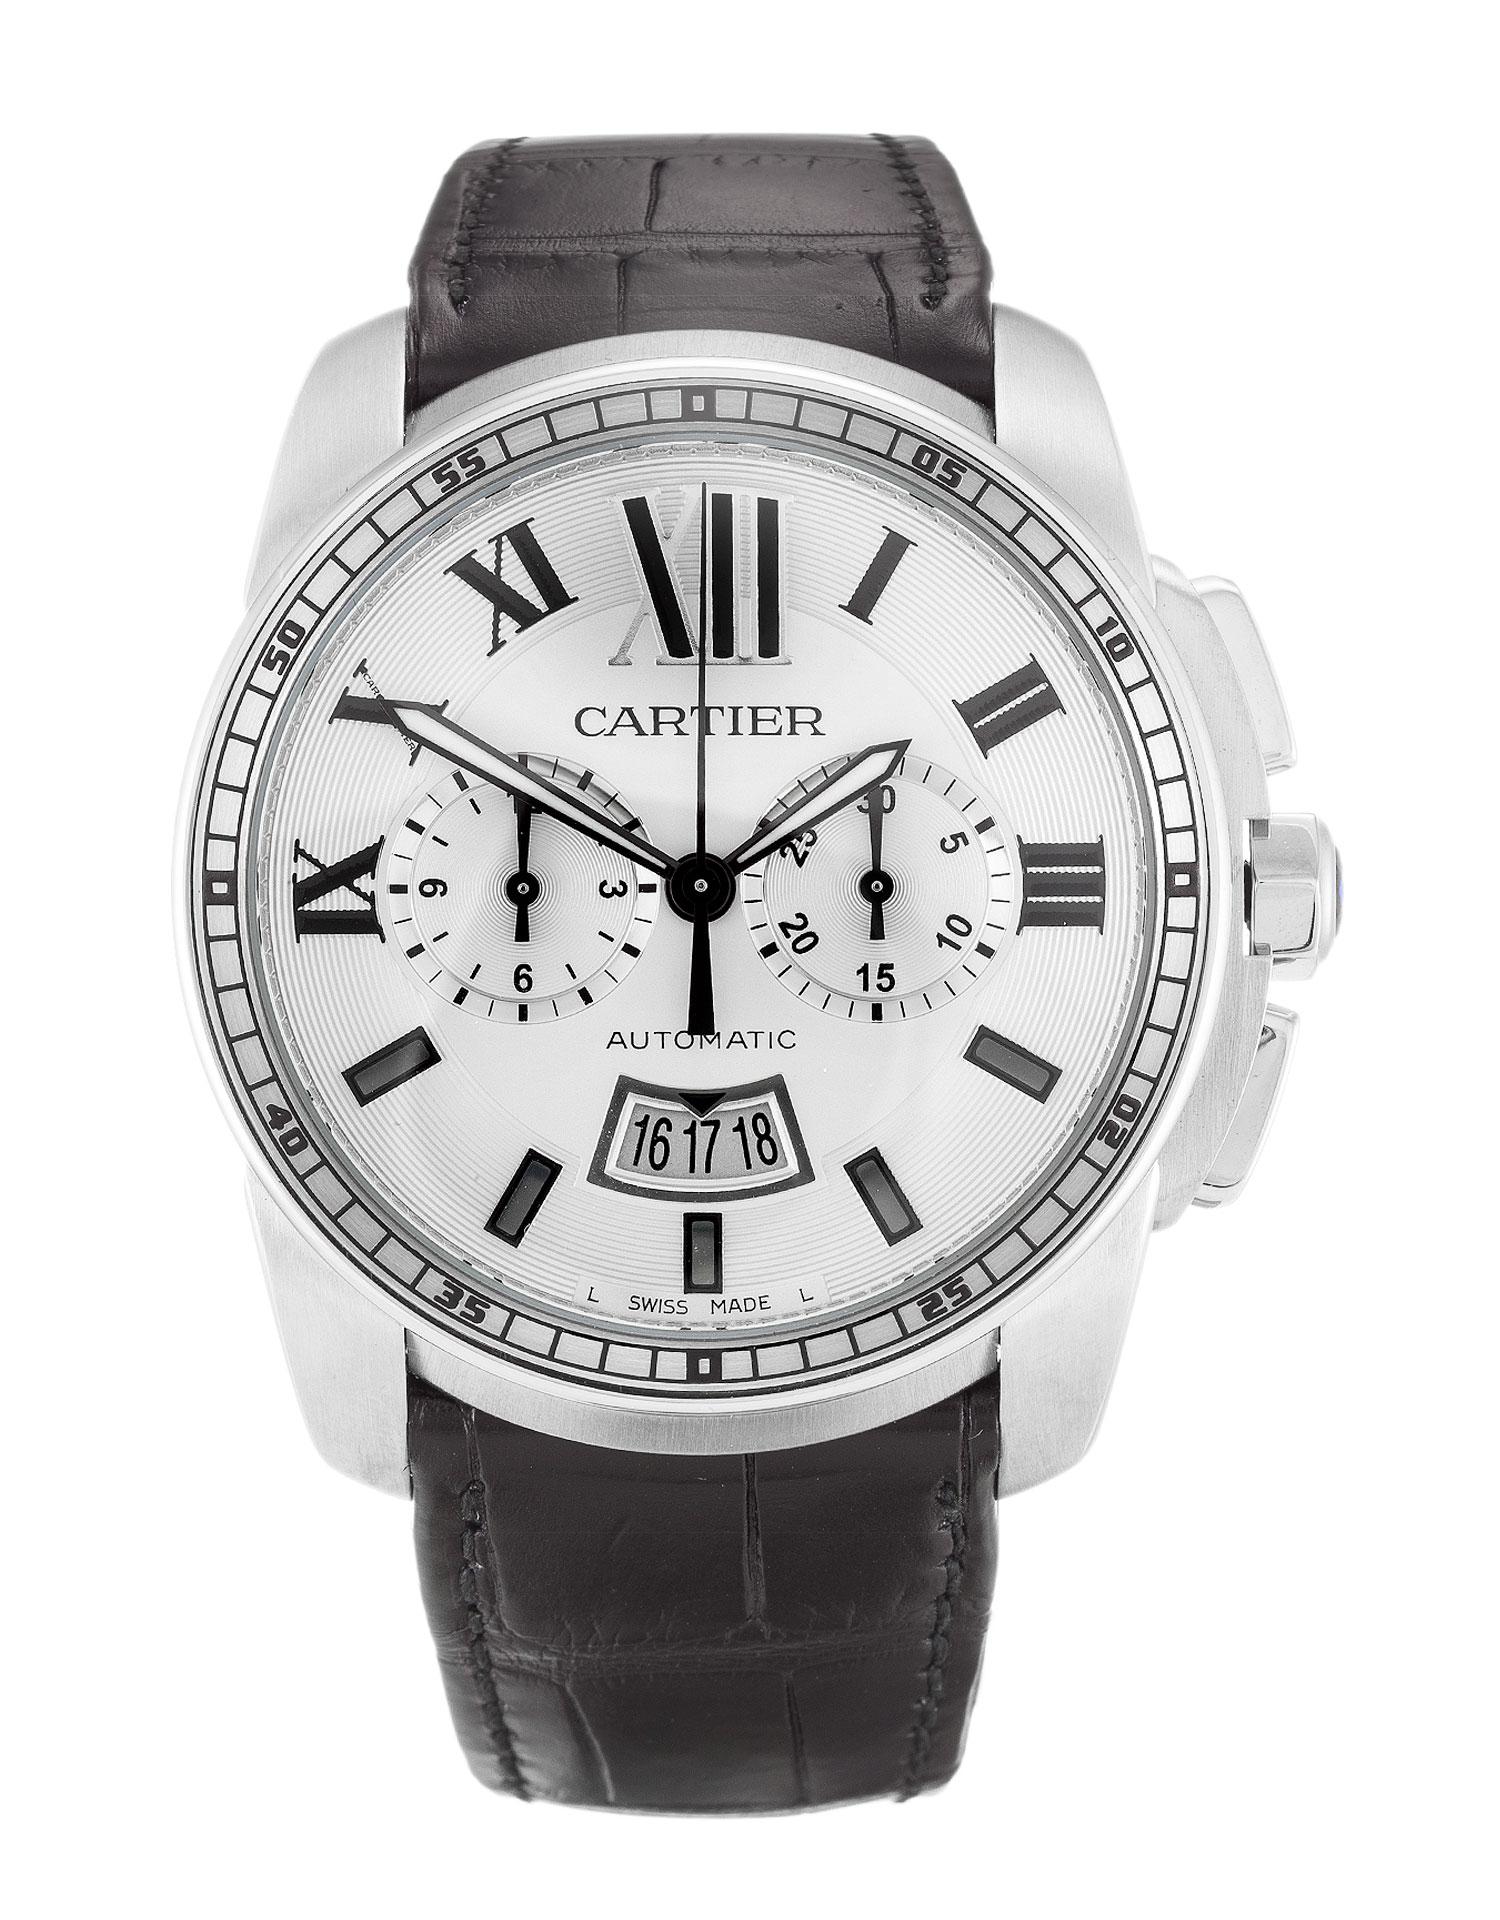 Cartier Calibre De Cartier W7100046 Mens 42 Mm Steel Case Quartz Movement – iapac.to